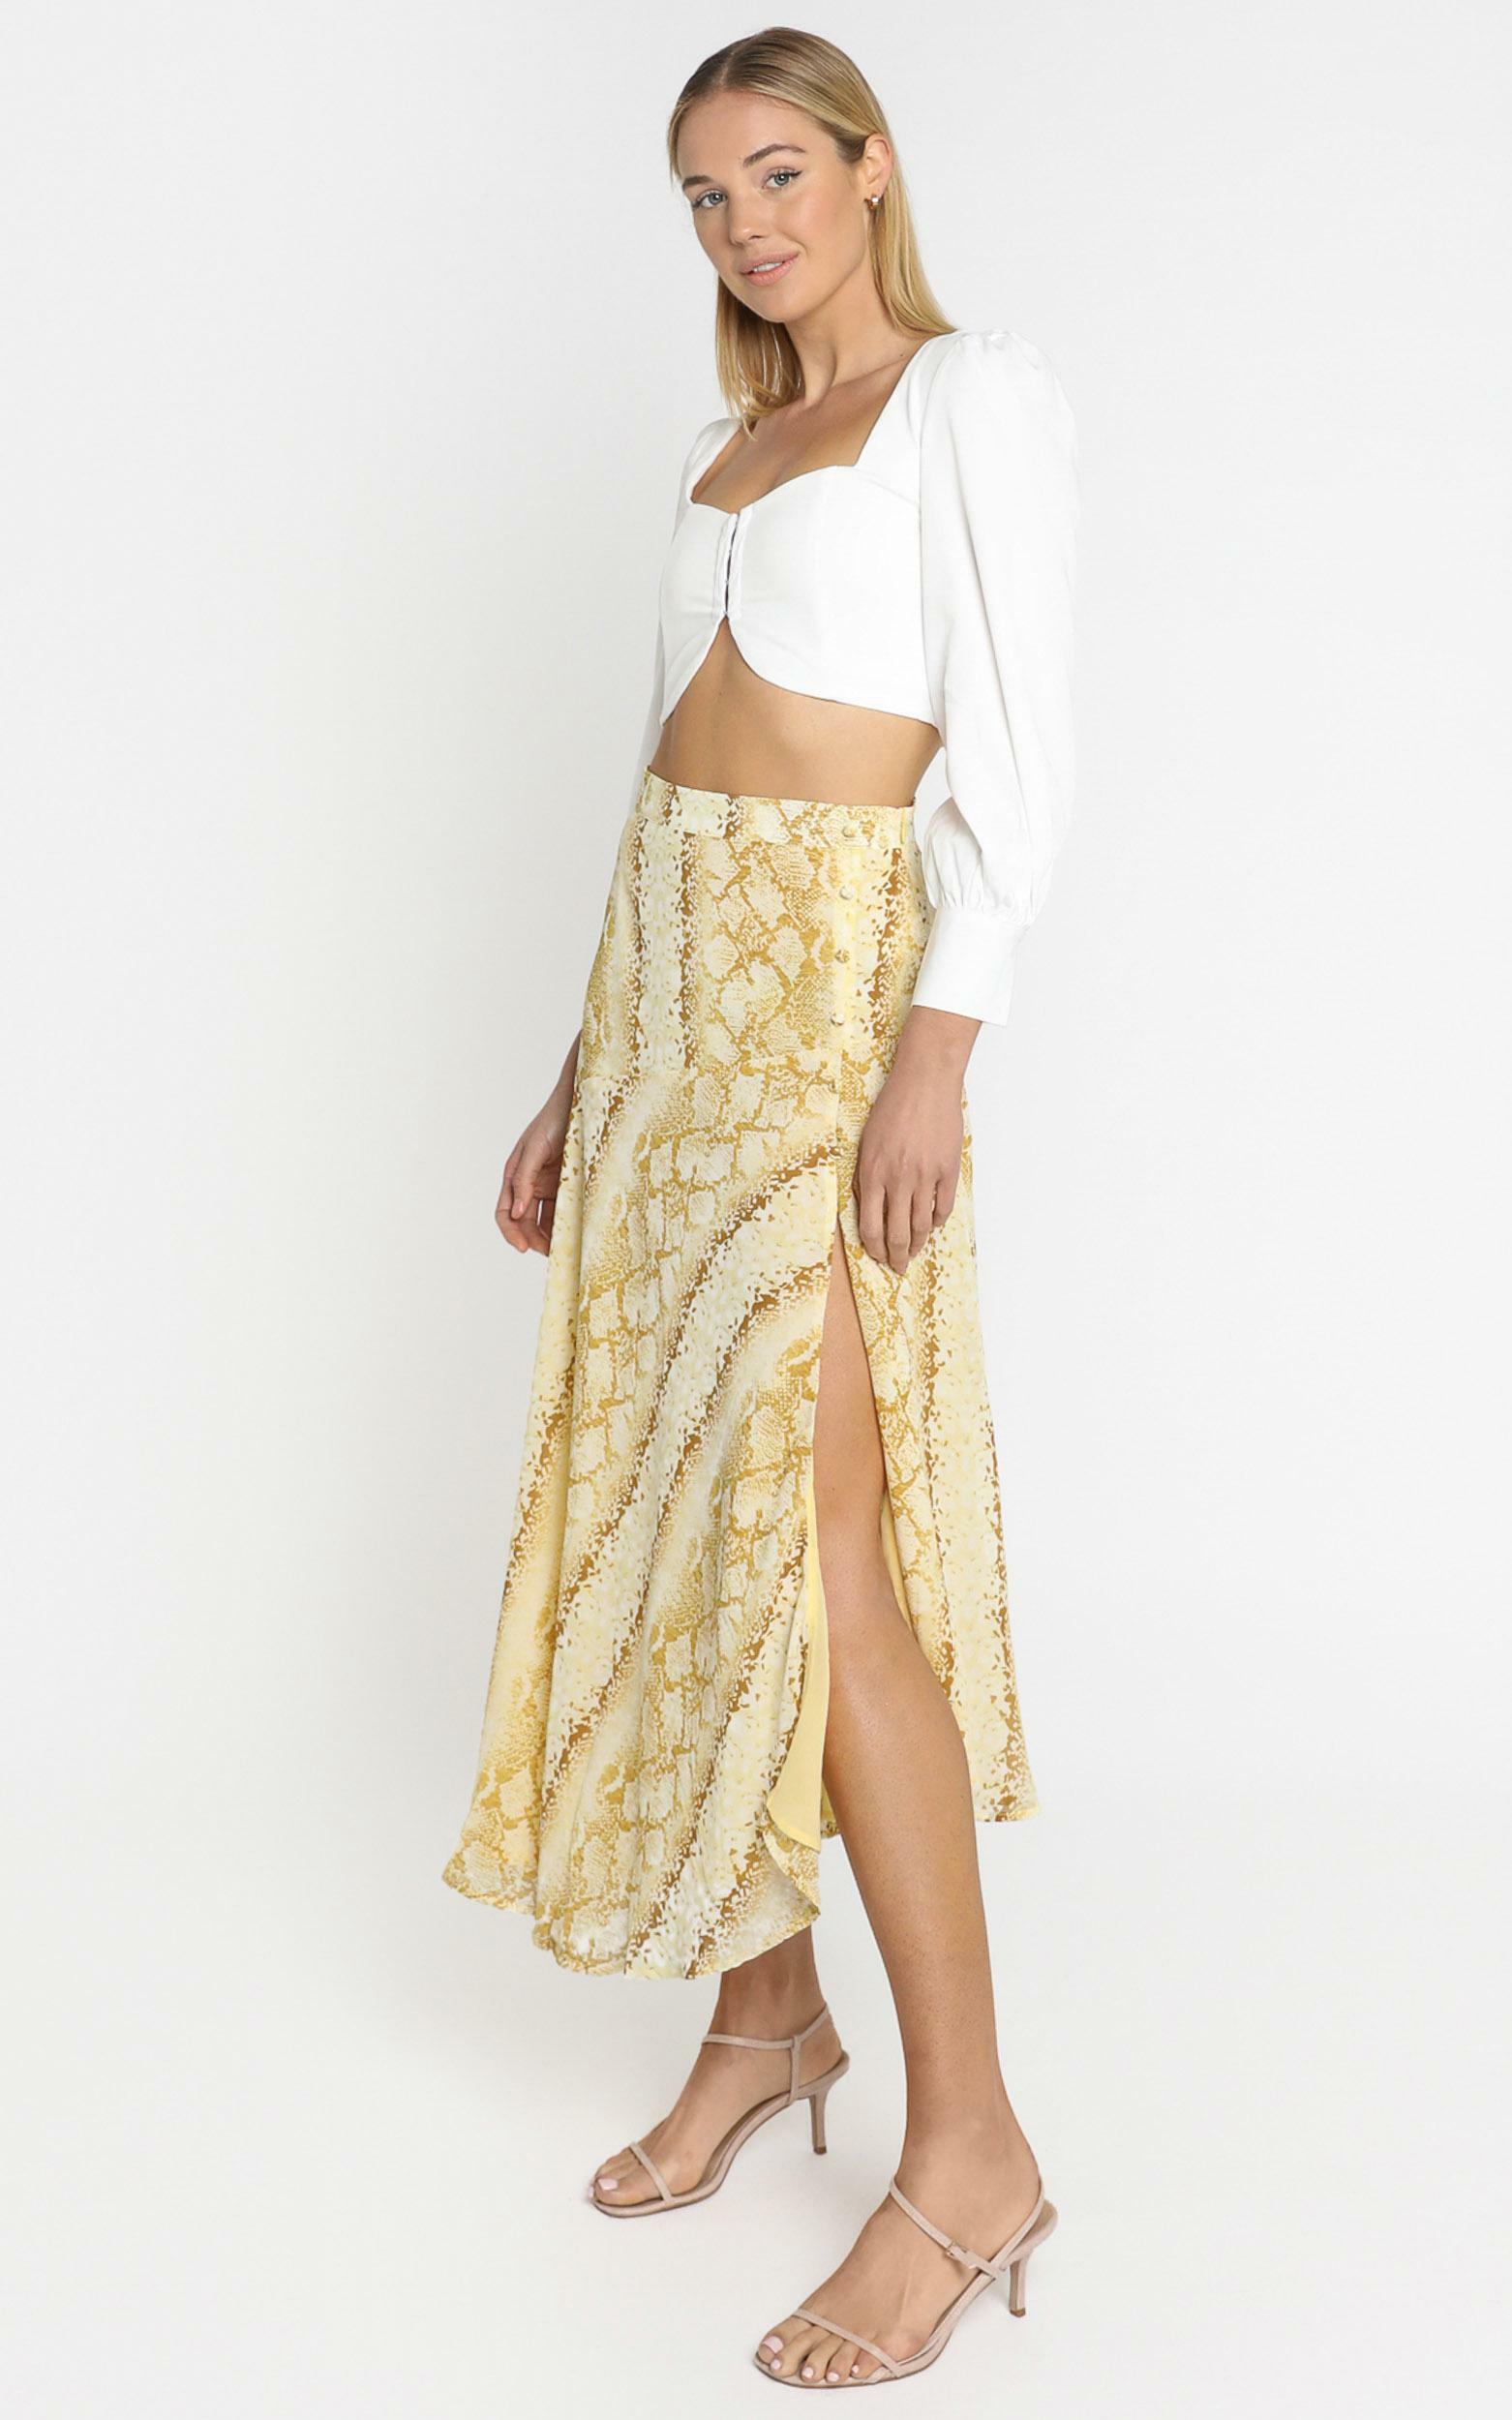 Lulu & Rose - Cali Skirt in Snake Print - 4 (XXS), Yellow, hi-res image number null